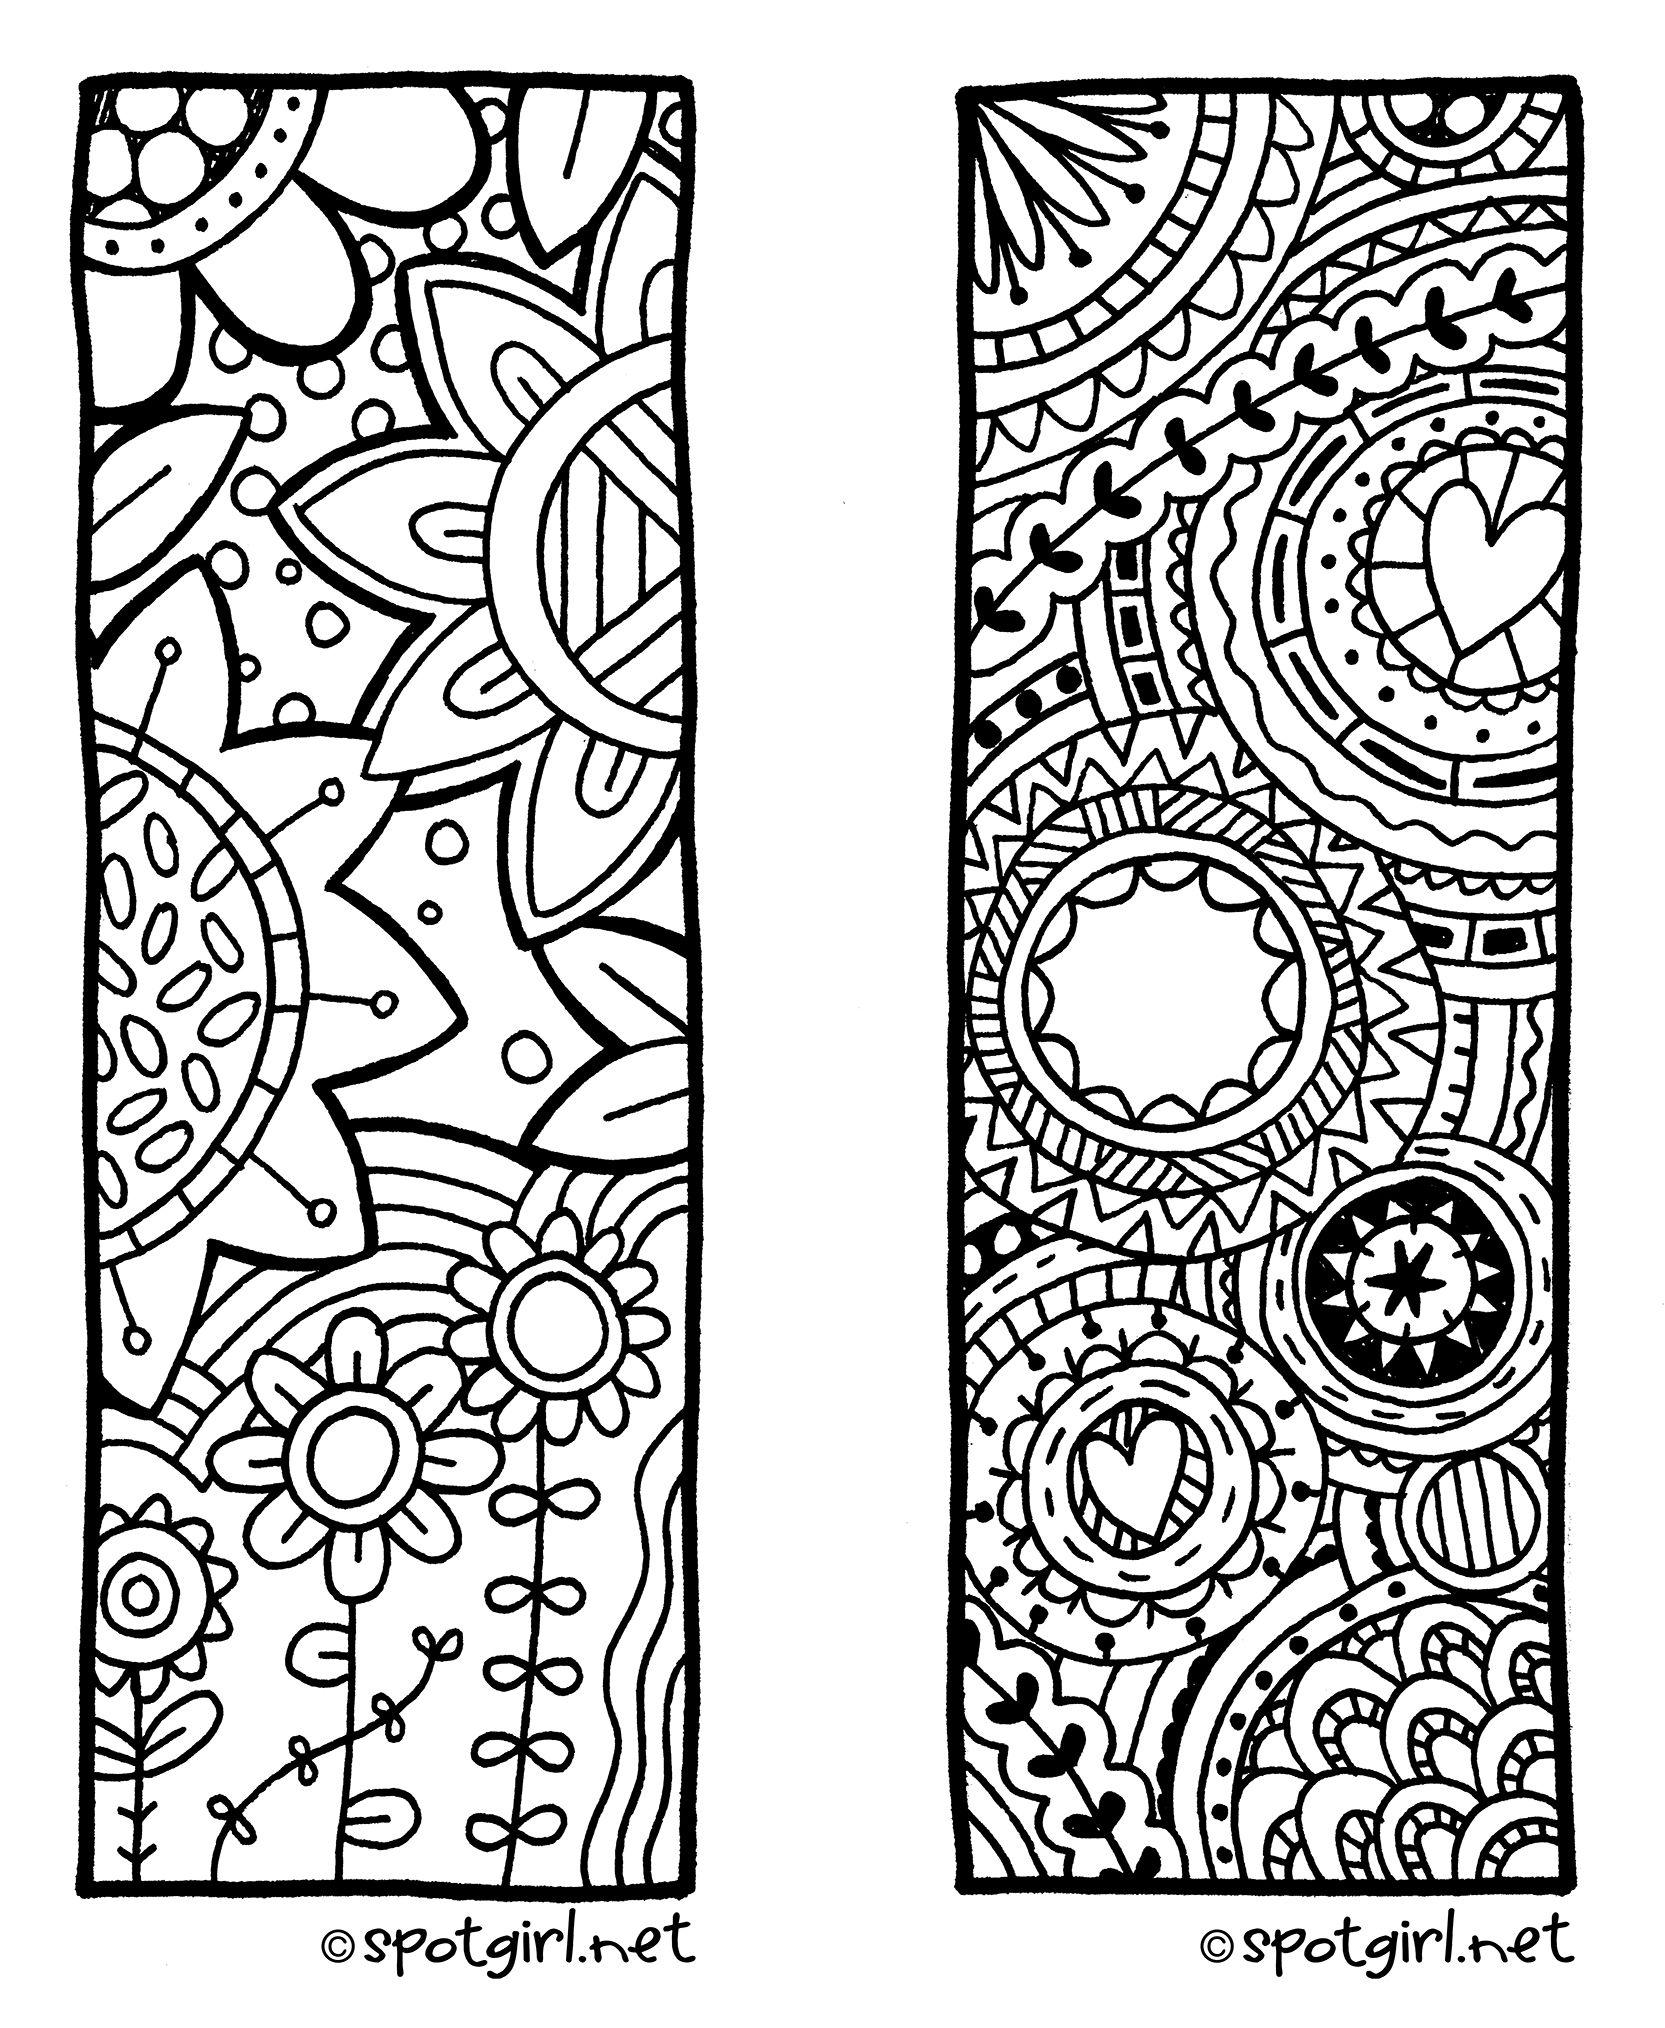 Hc Bookmarkset Lr Jpg 1 665 2 028 Pixels Coloring Bookmarks Bookmarks Printable Coloring Pages